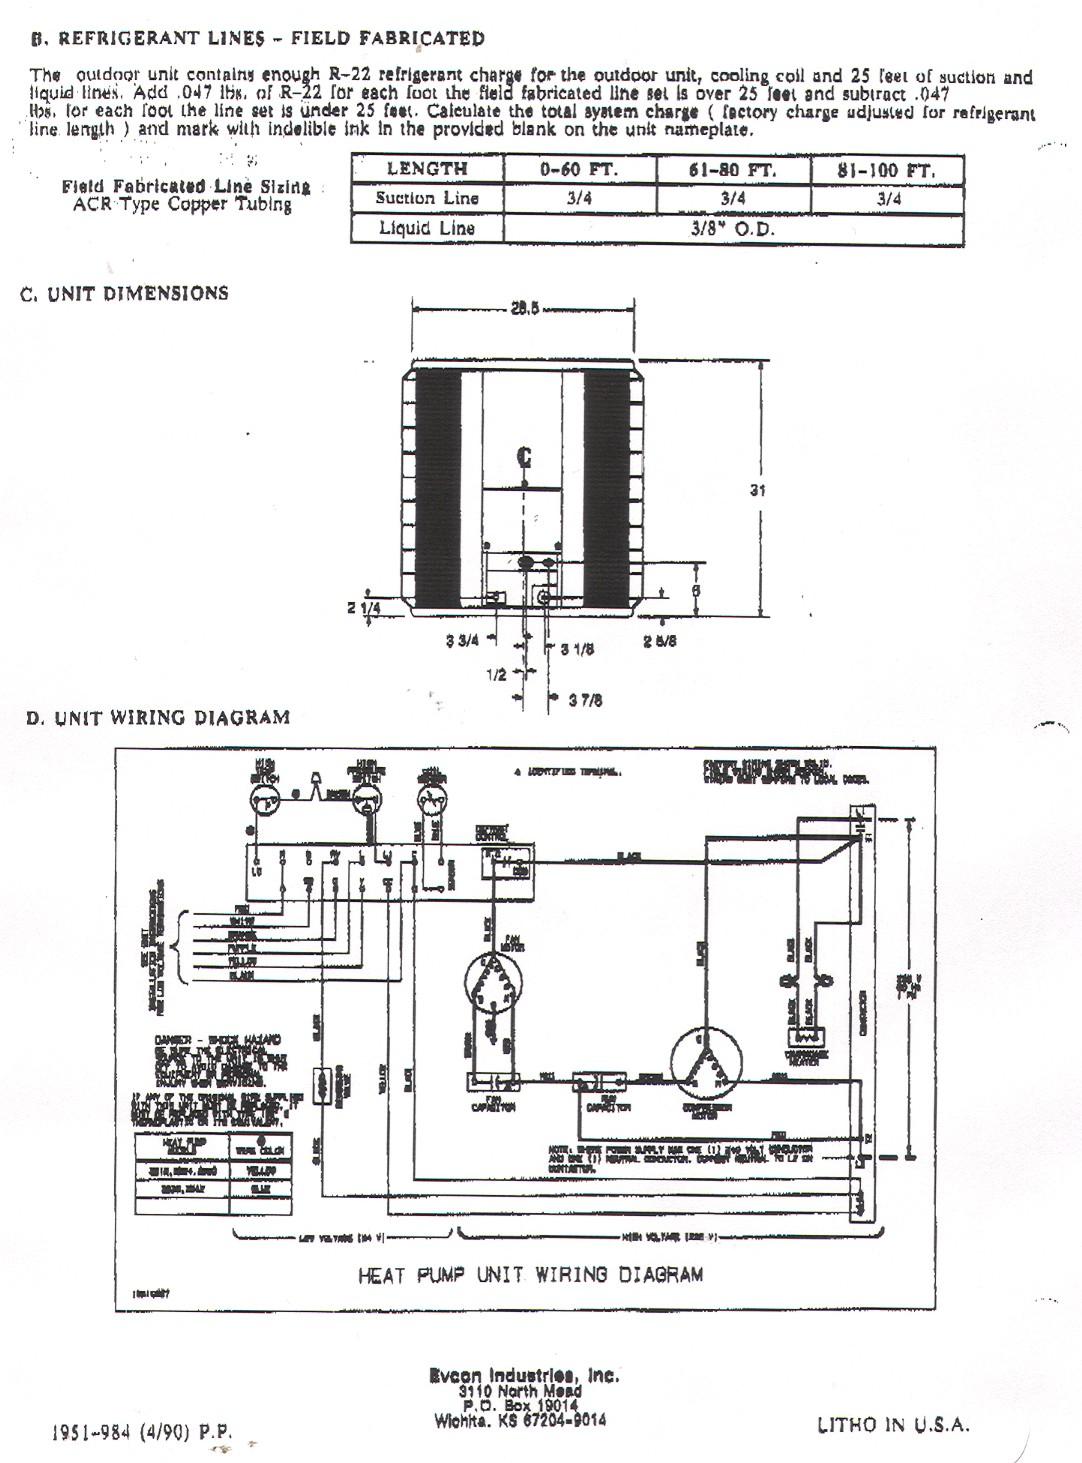 Electric Heat Pump Wiring Diagram | Wiring Diagram - Goodman Heat Pump Wiring Diagram